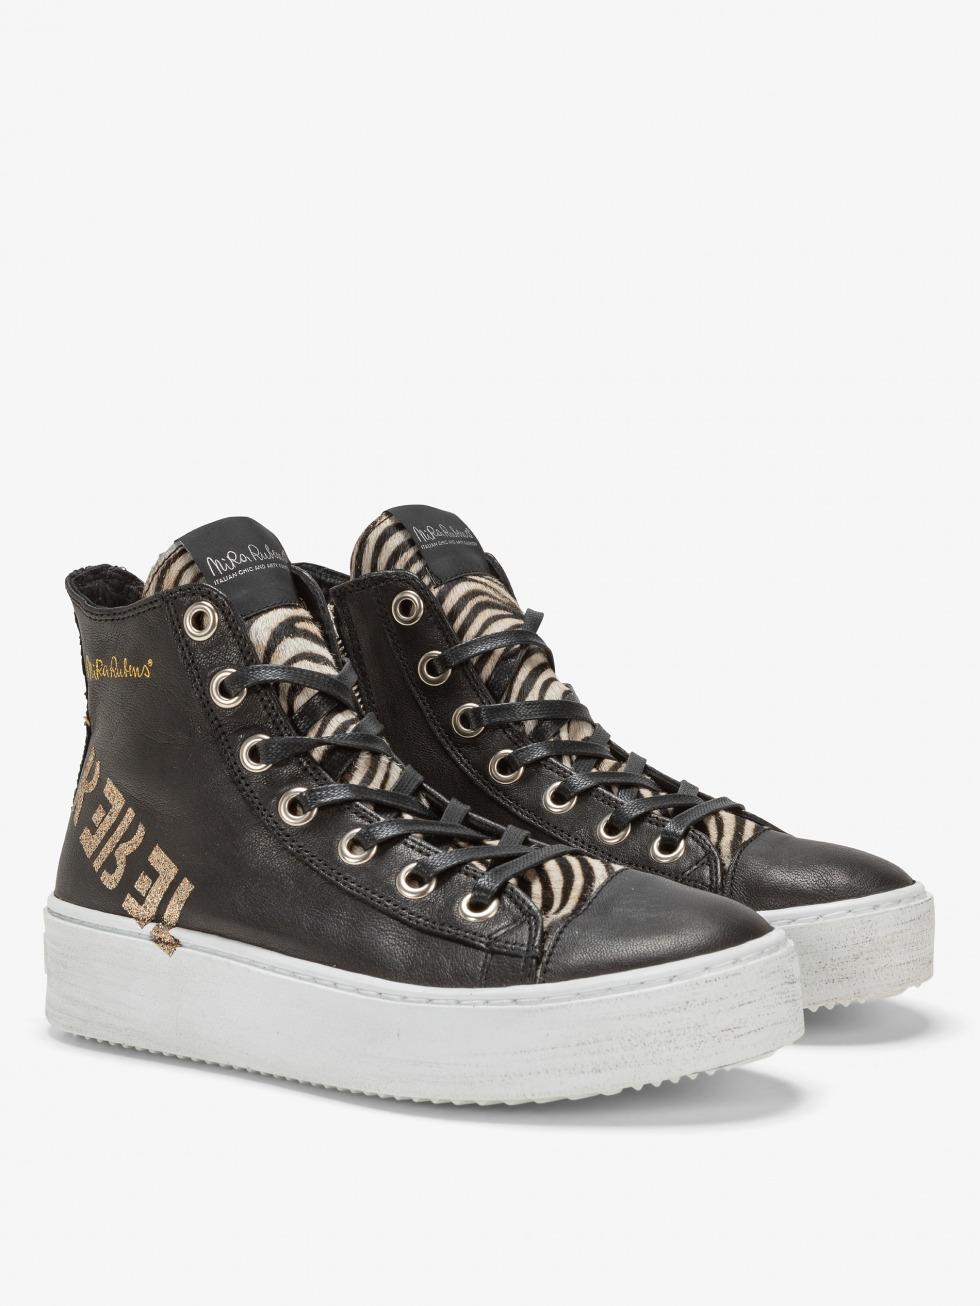 sneakers-long-island-rebel-black-zebrina-glitter-2